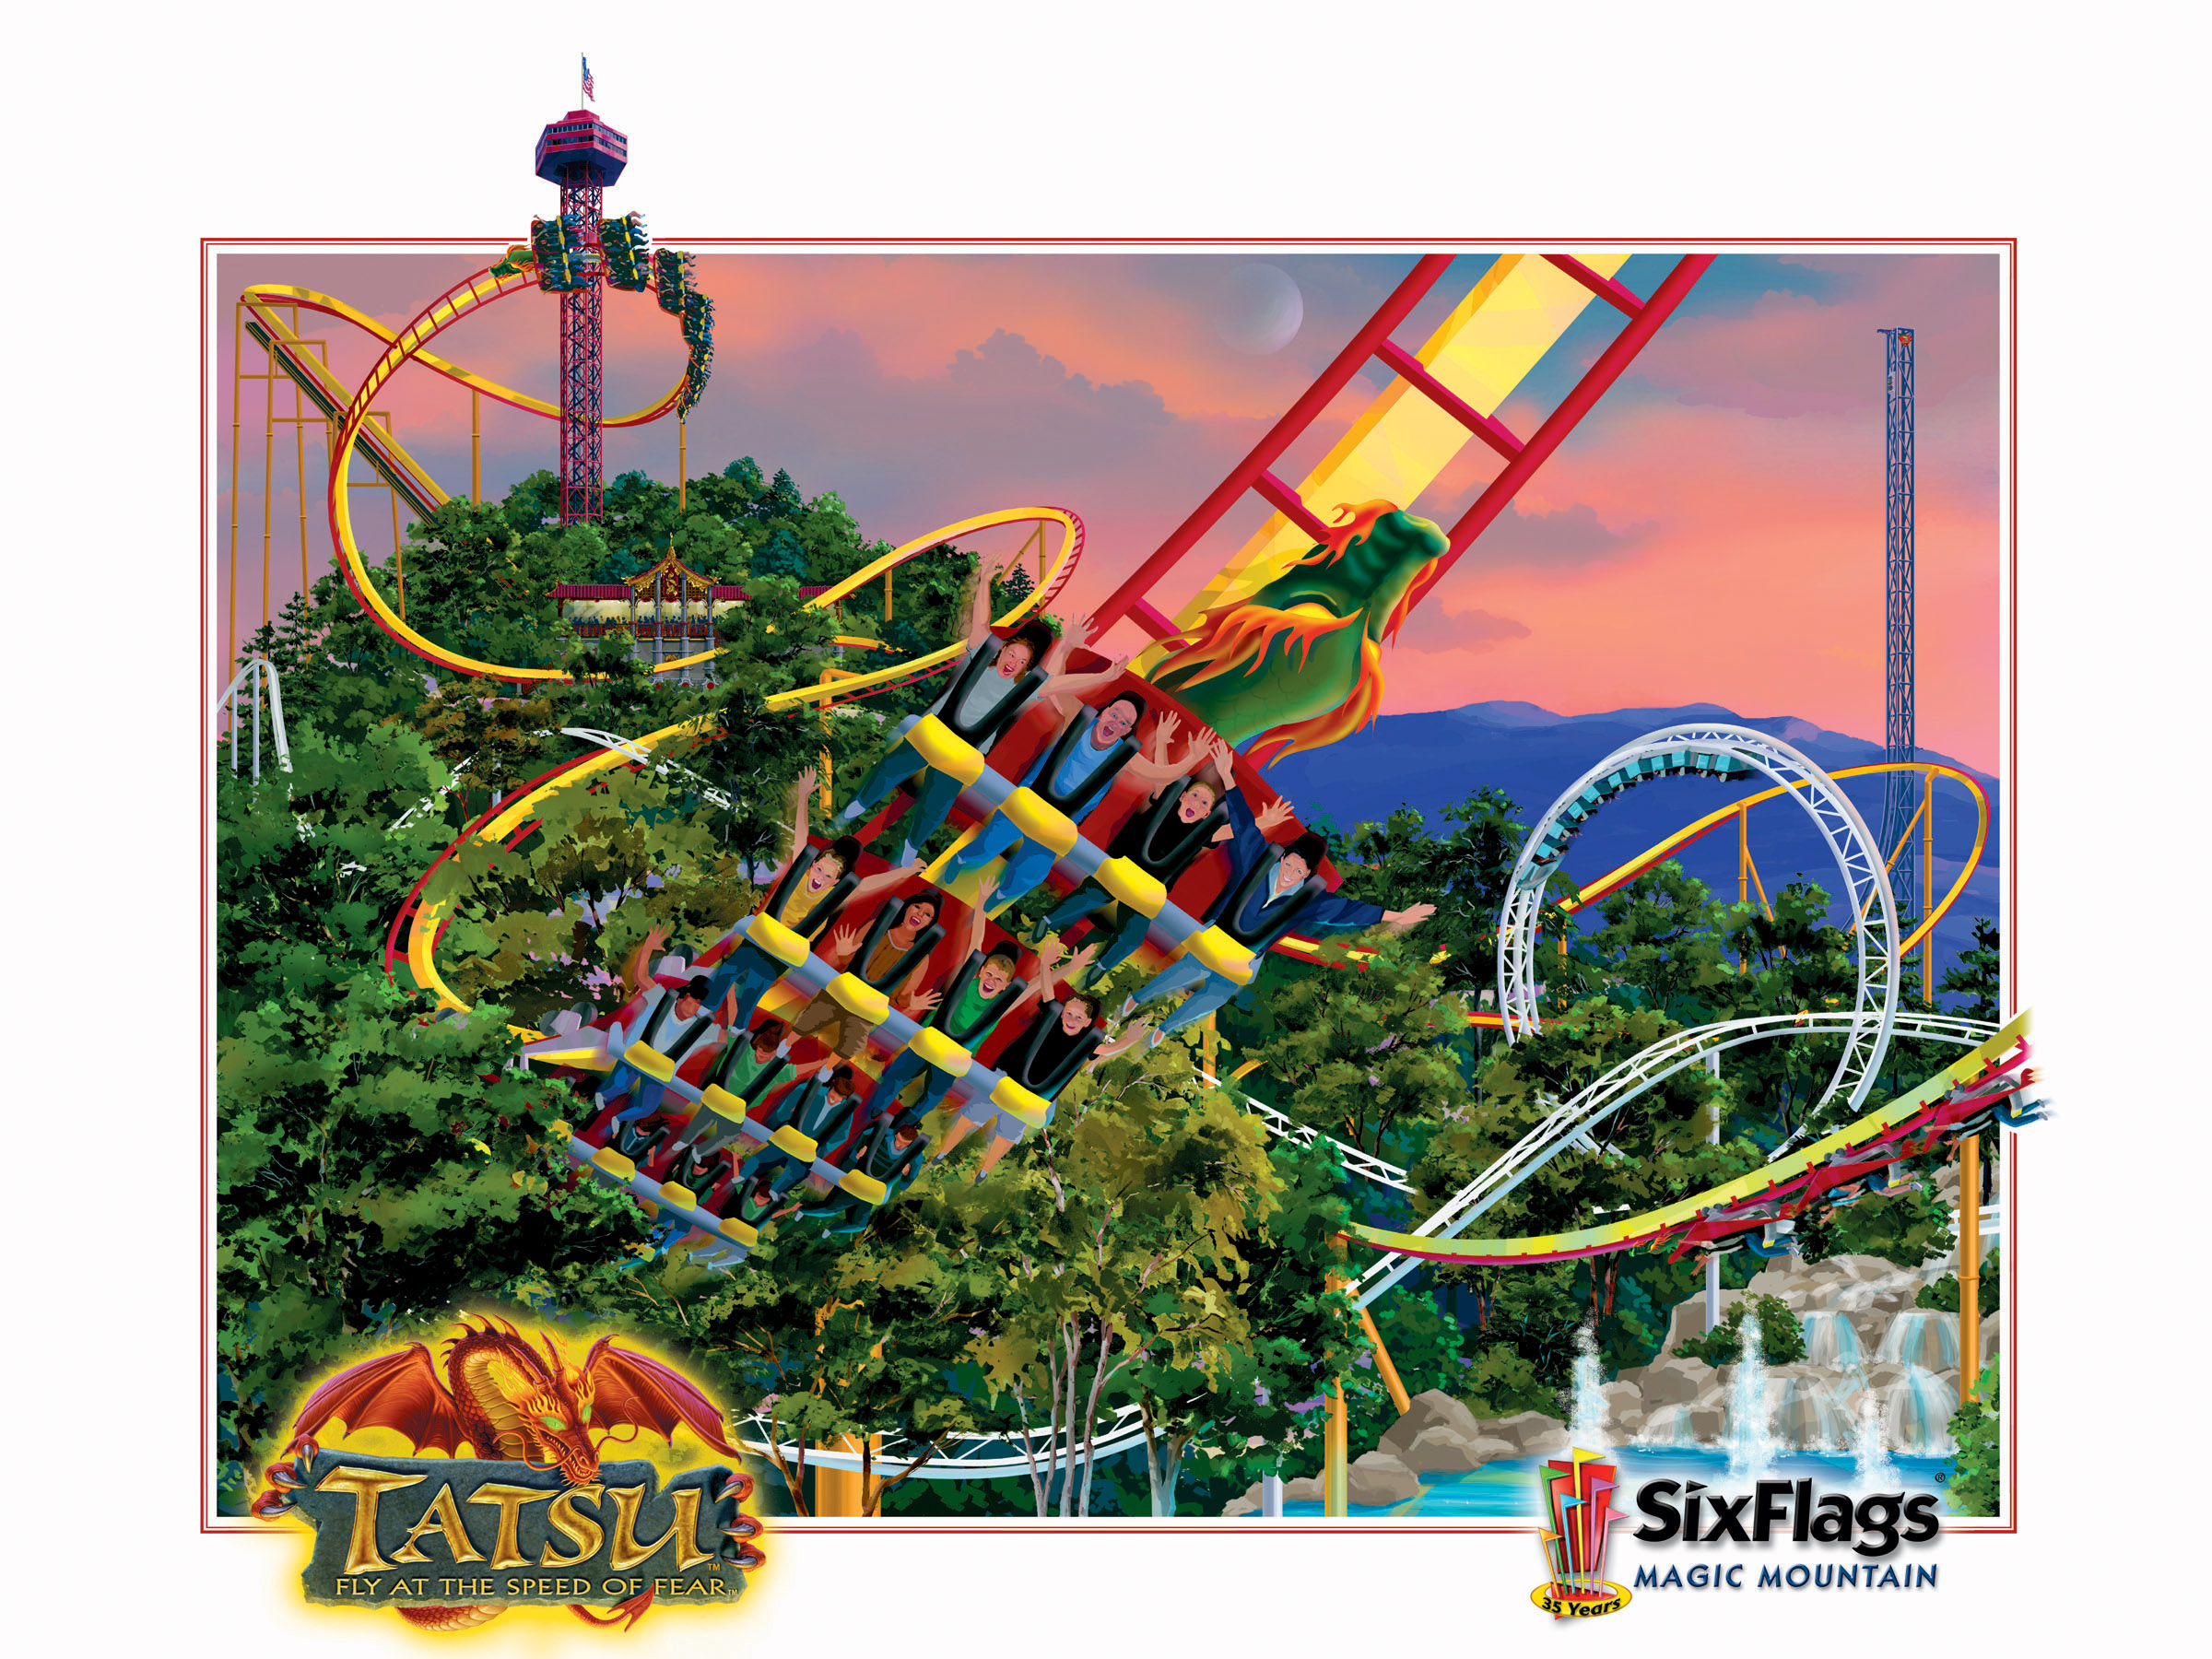 Six Flags Magic Mountain Photos 2400x1800